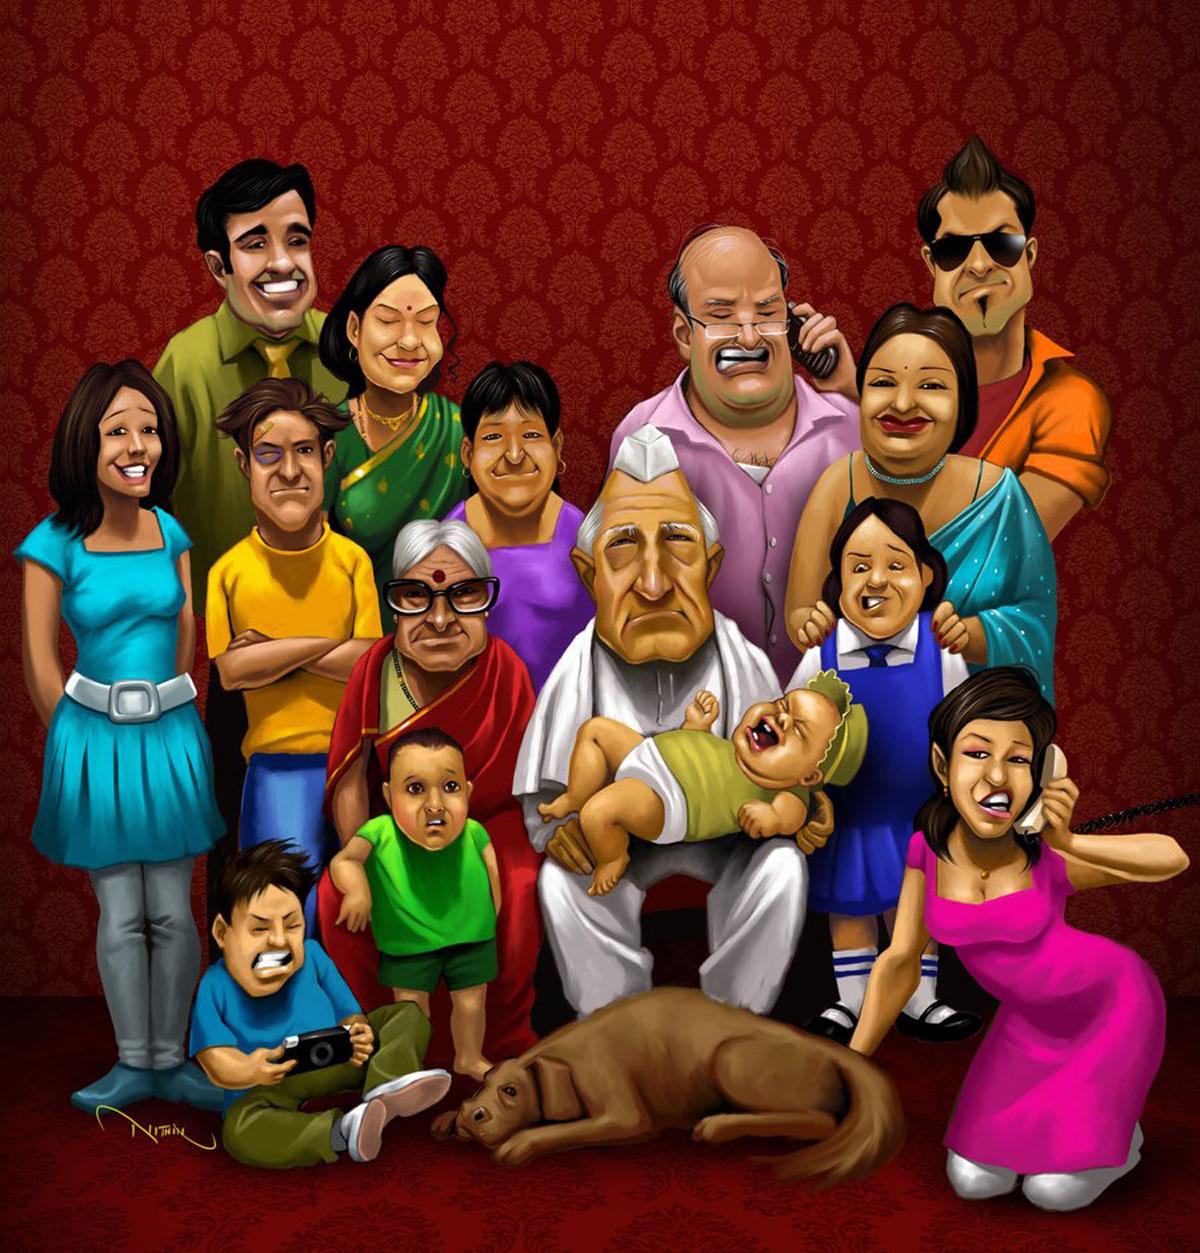 Hindu undivided family clipart.